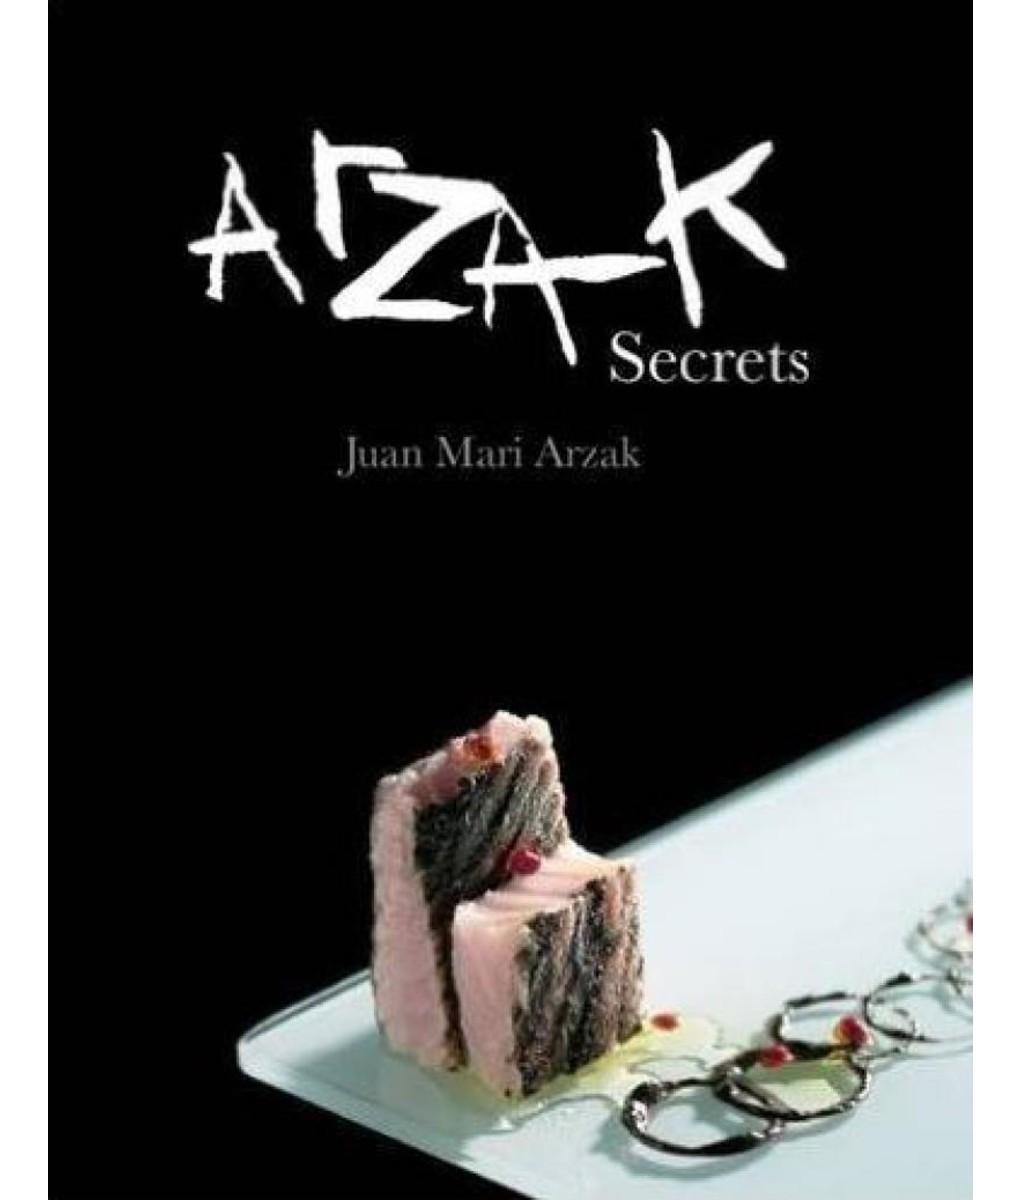 Arzak Secrets by Juan Mari Arzak